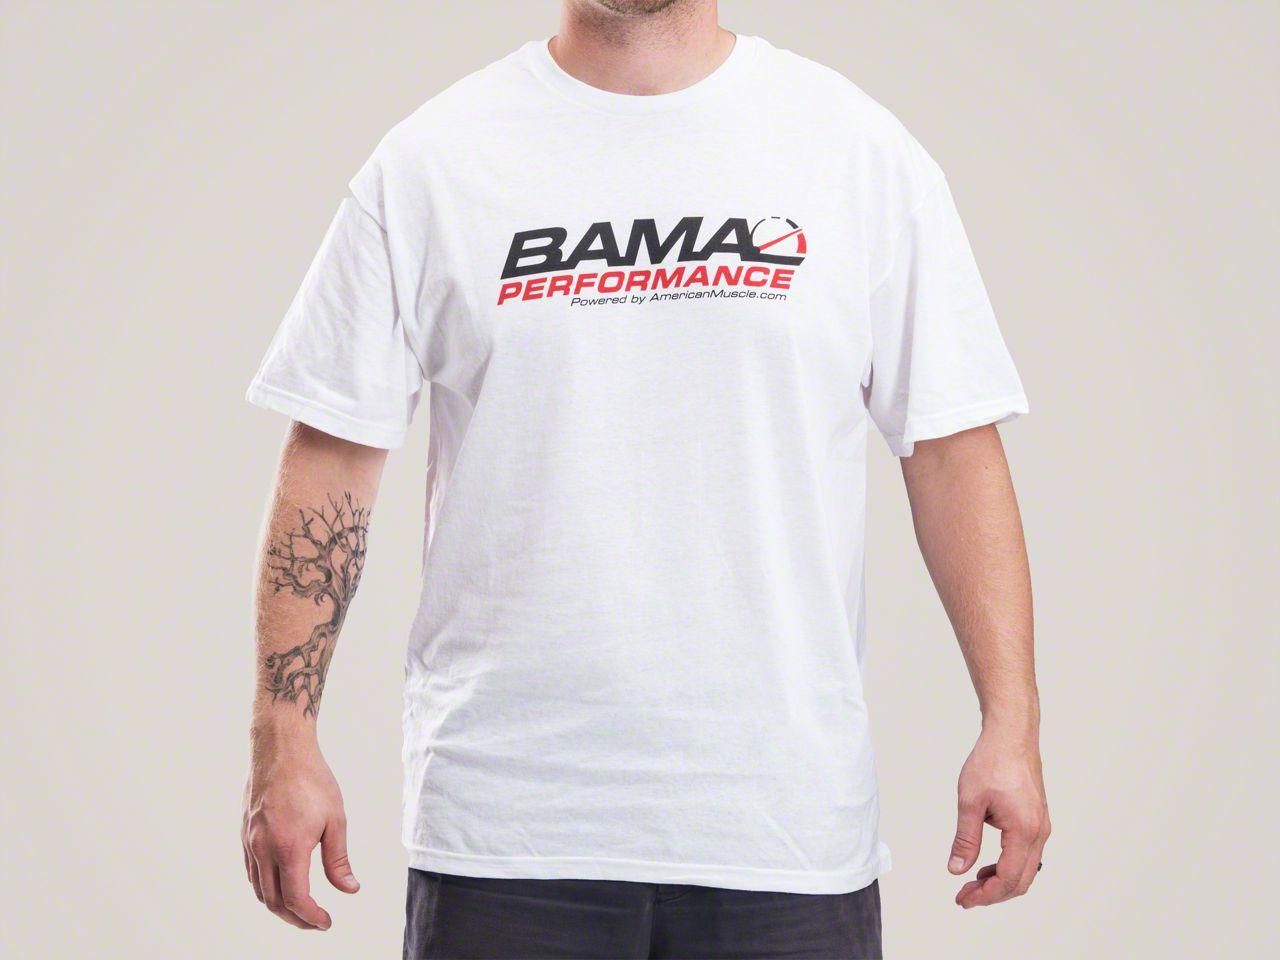 Bama Performance T-Shirt - Men's XL